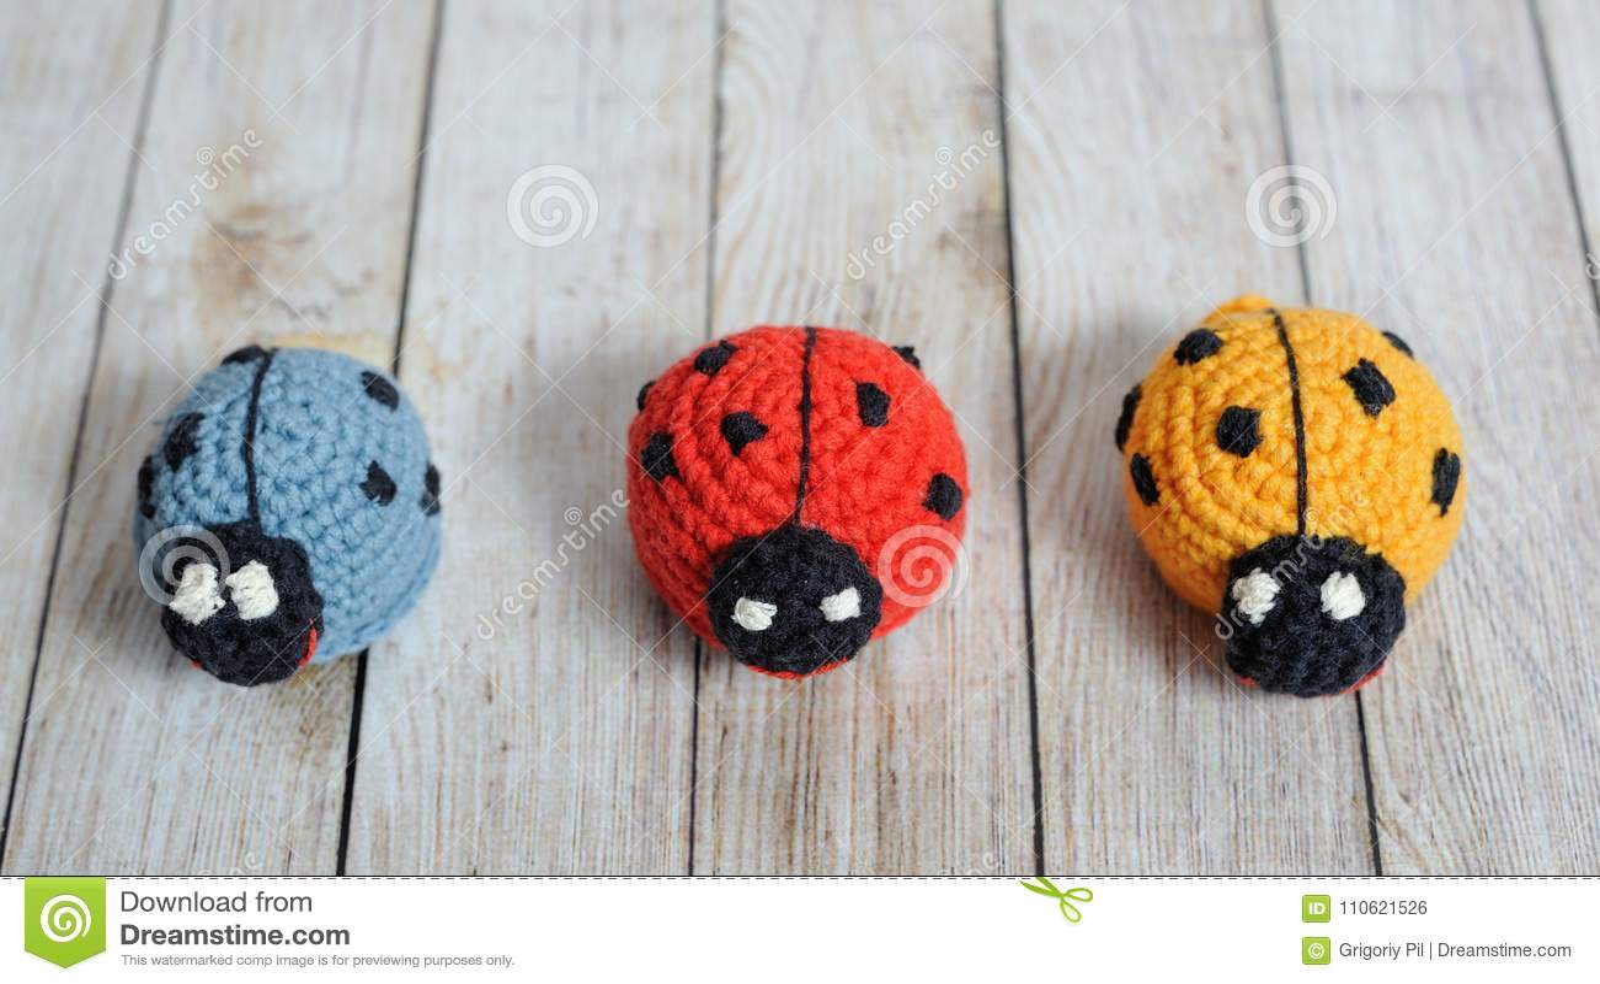 Ladybug Crochet Pattern Cute Ideas Easy Video Tutorial   817x1300